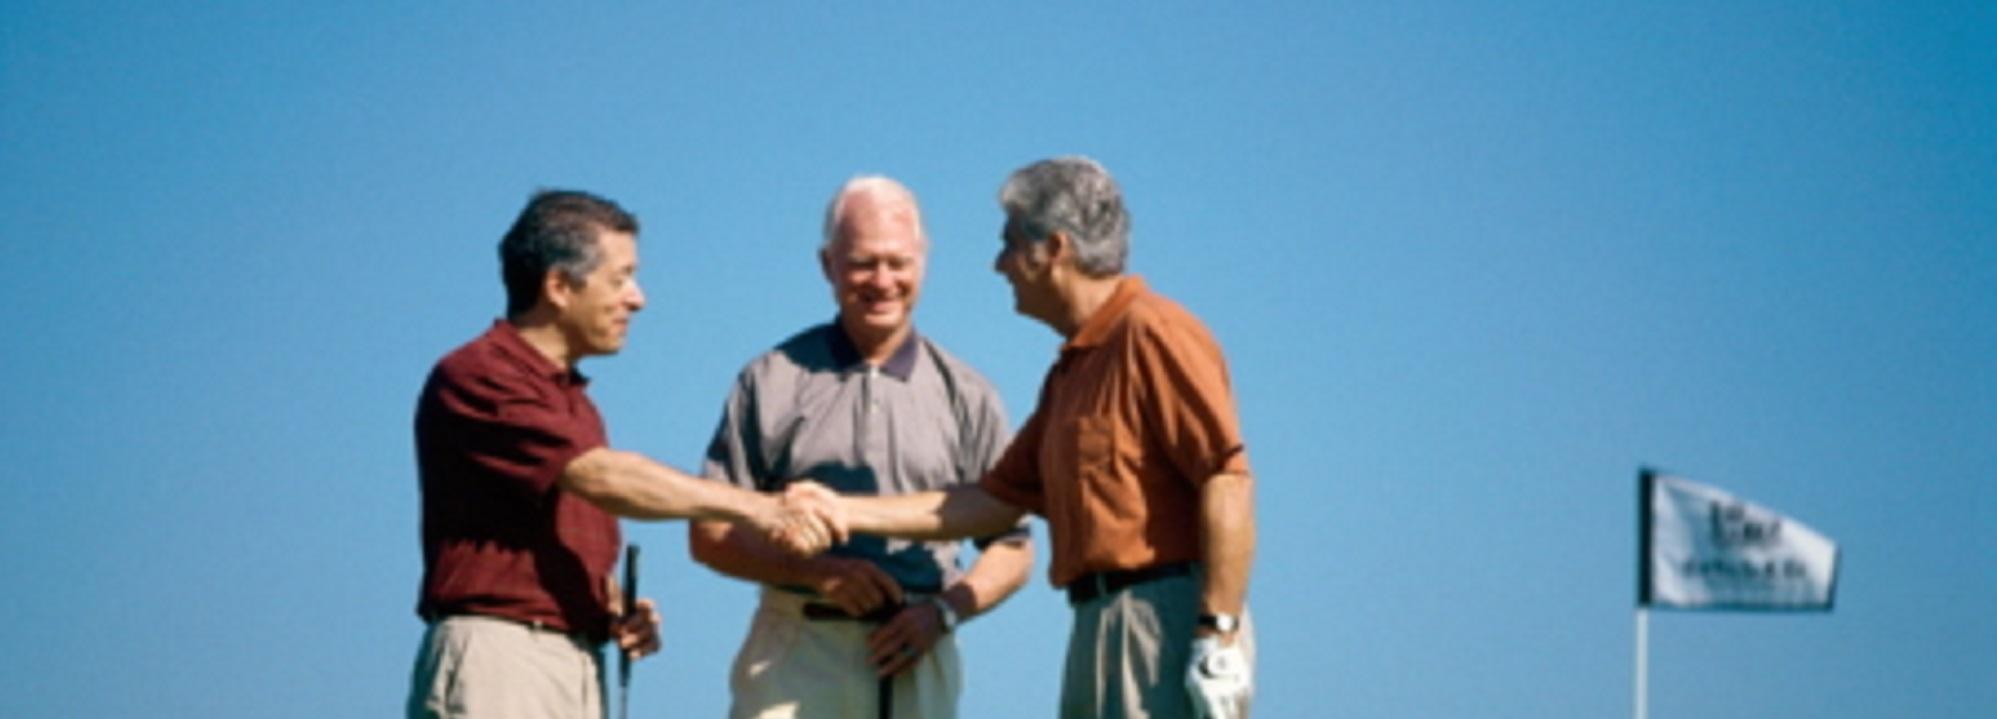 investir immobilier seniors